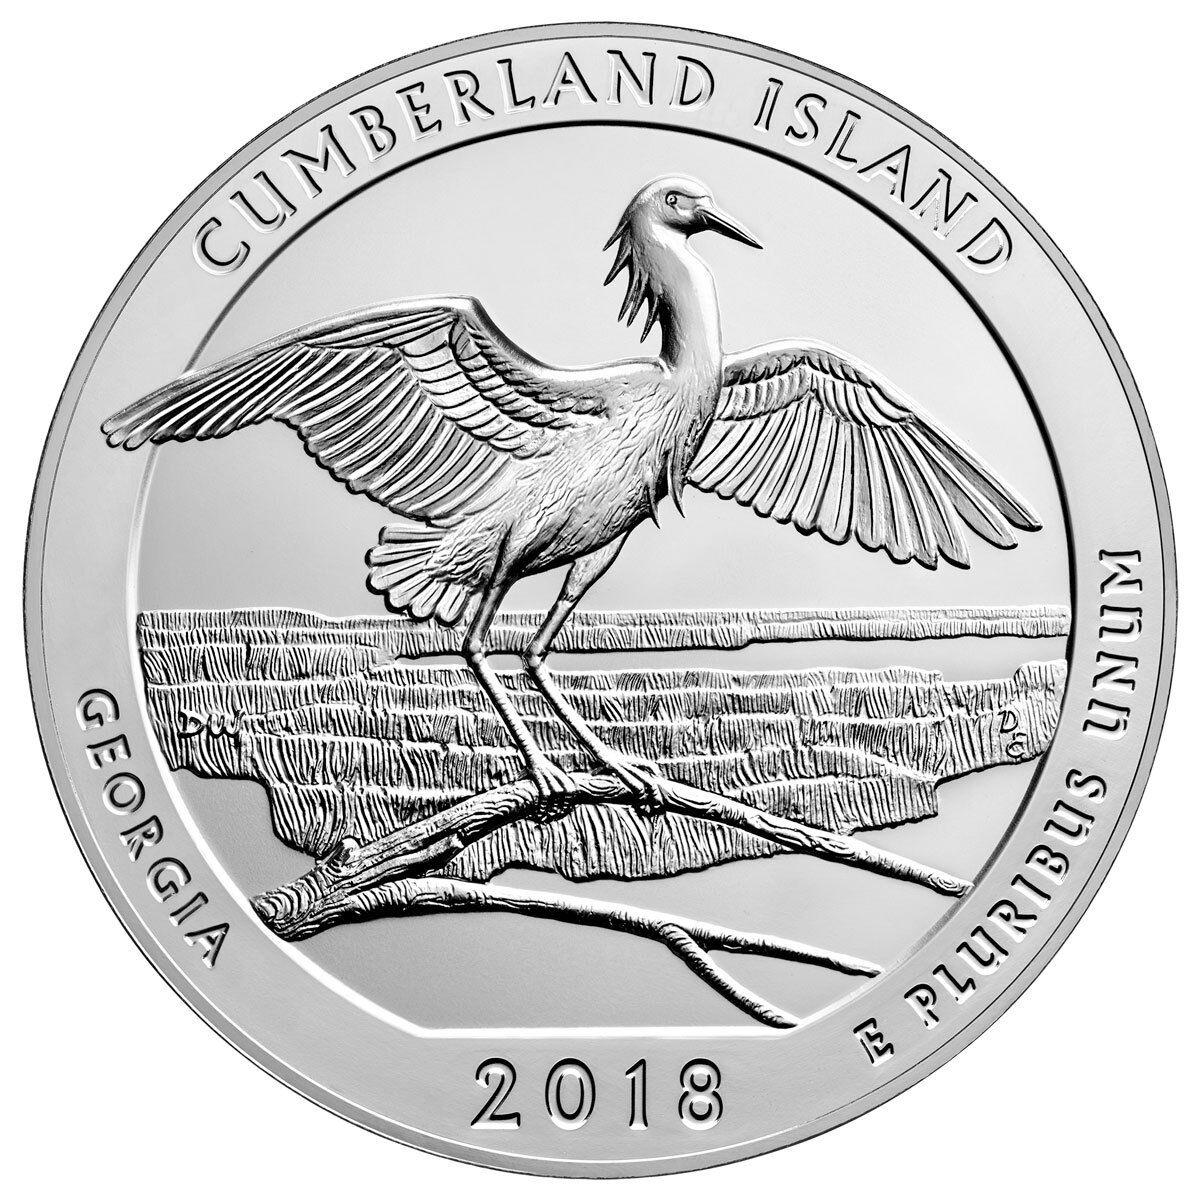 2018 Cumberland Island 5 oz. Silver ATB Beautiful Coin GEM BU SKU49860